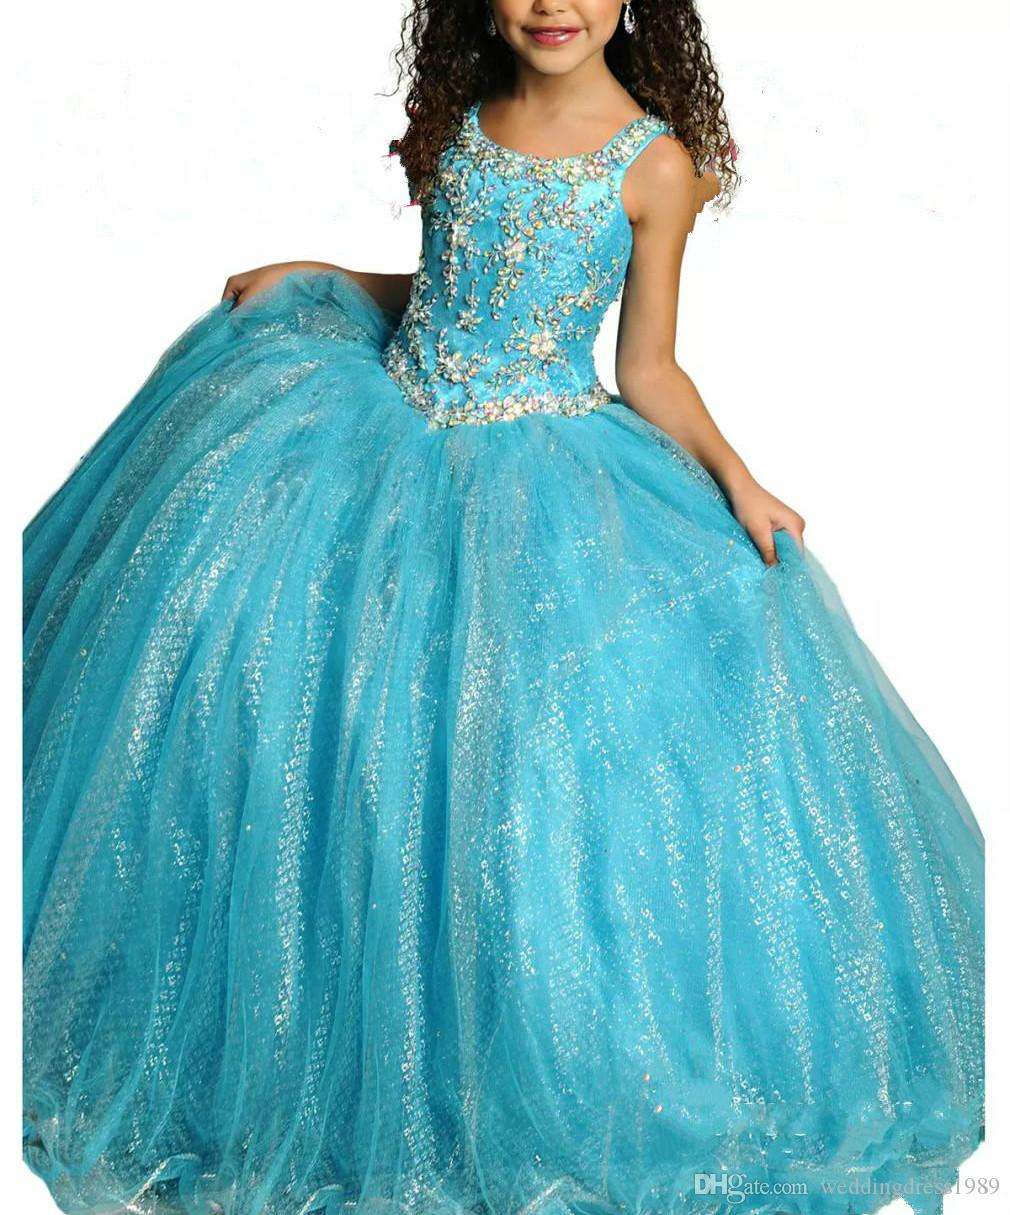 Bling Children Ball Gown Little Girls Pageant Dresses Sequined ...